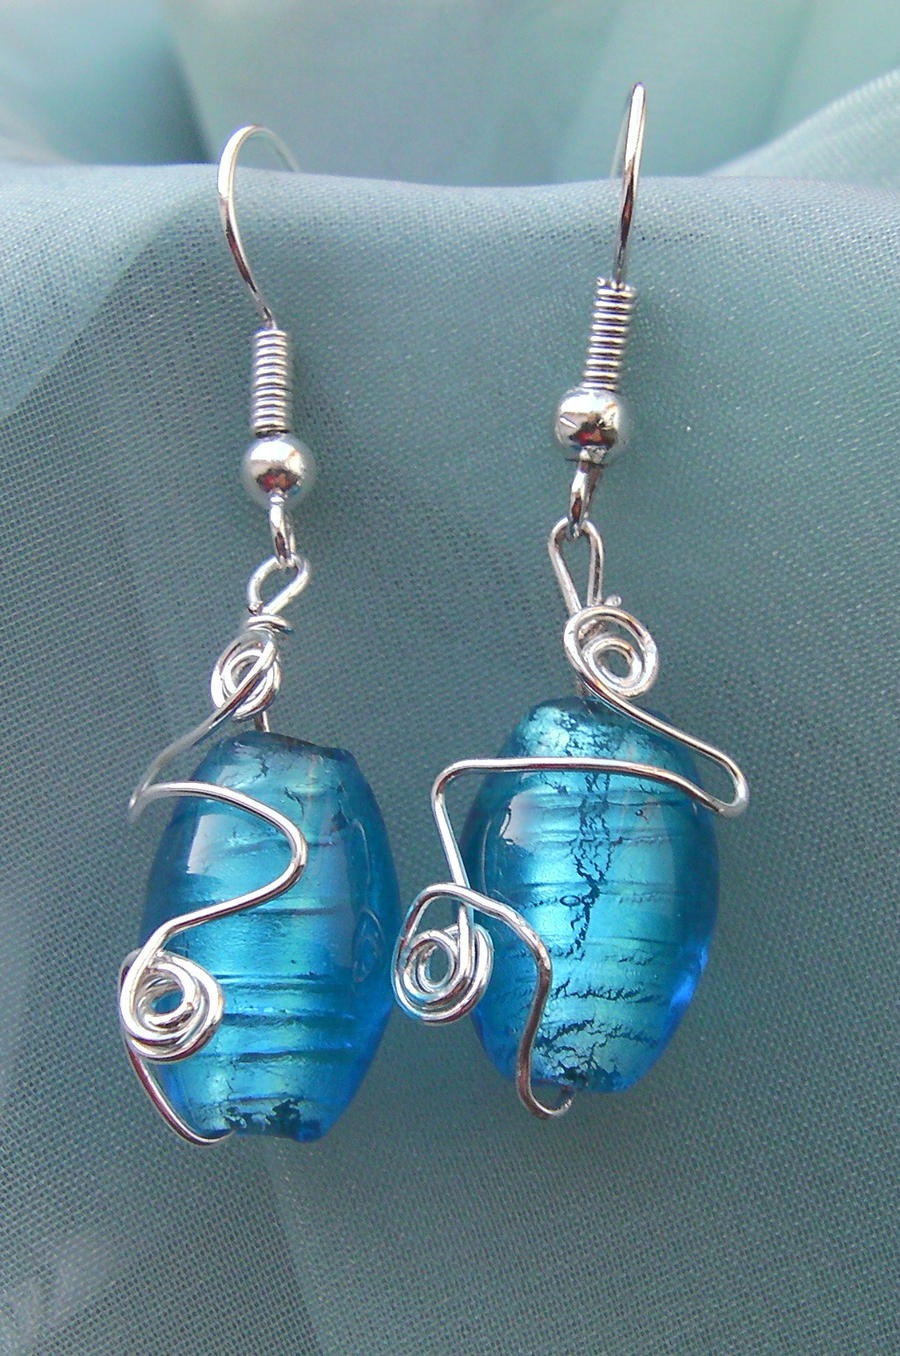 Wire Wrapped Blue Foil Bead Earrings 2 by cunningcatcrafts on DeviantArt